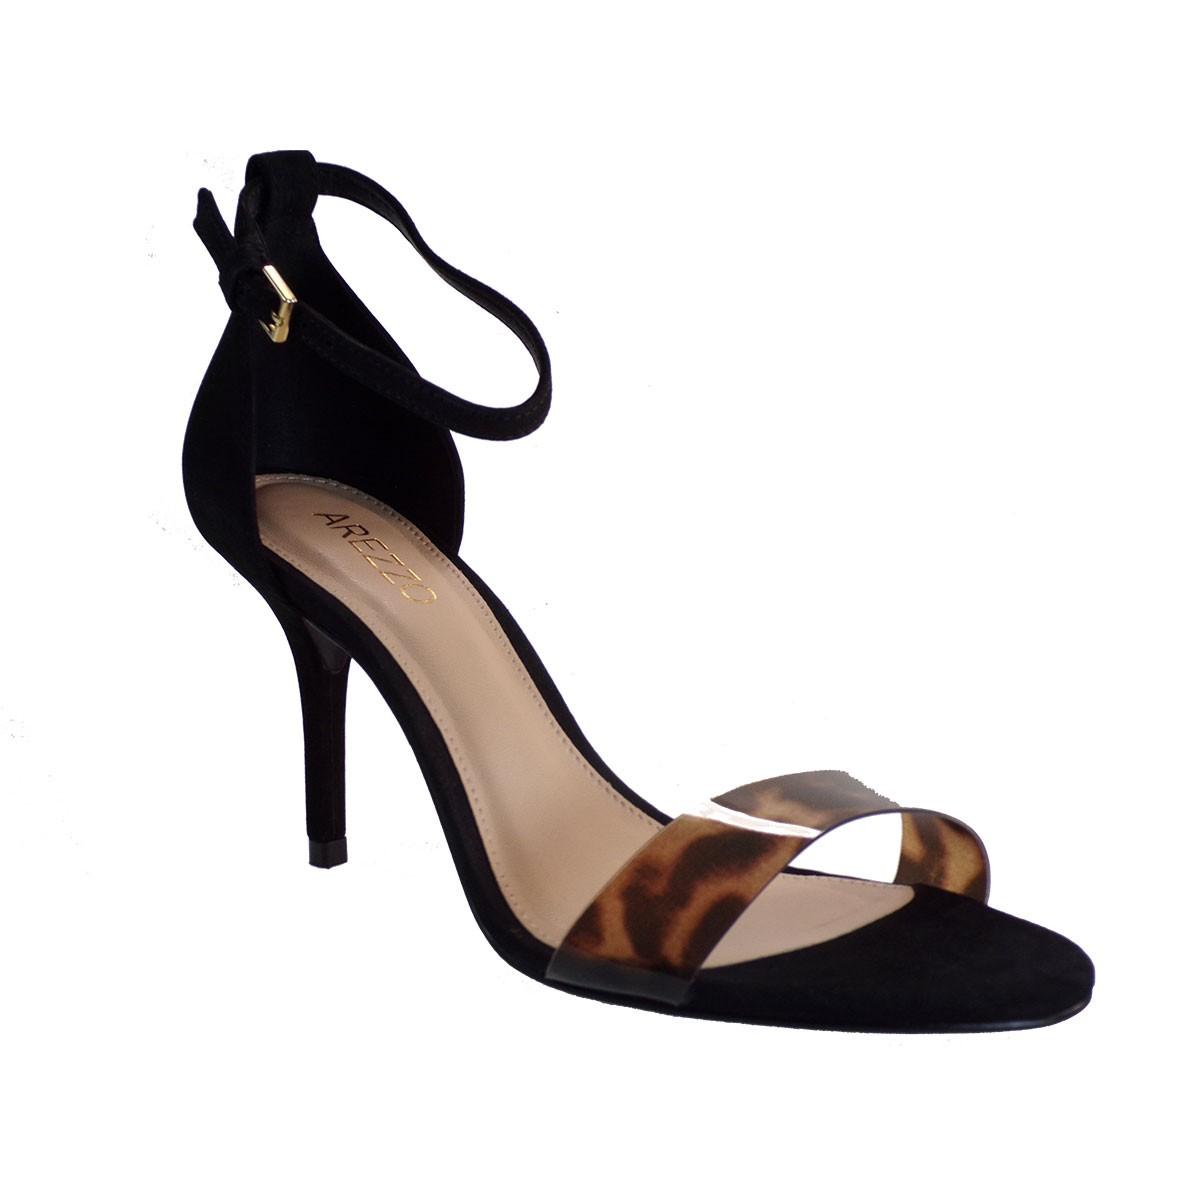 Arezzo SANDALIA Salto Medio Γυναικεία Παπούτσια Πέδιλα Α02695-0579 Μαύρο